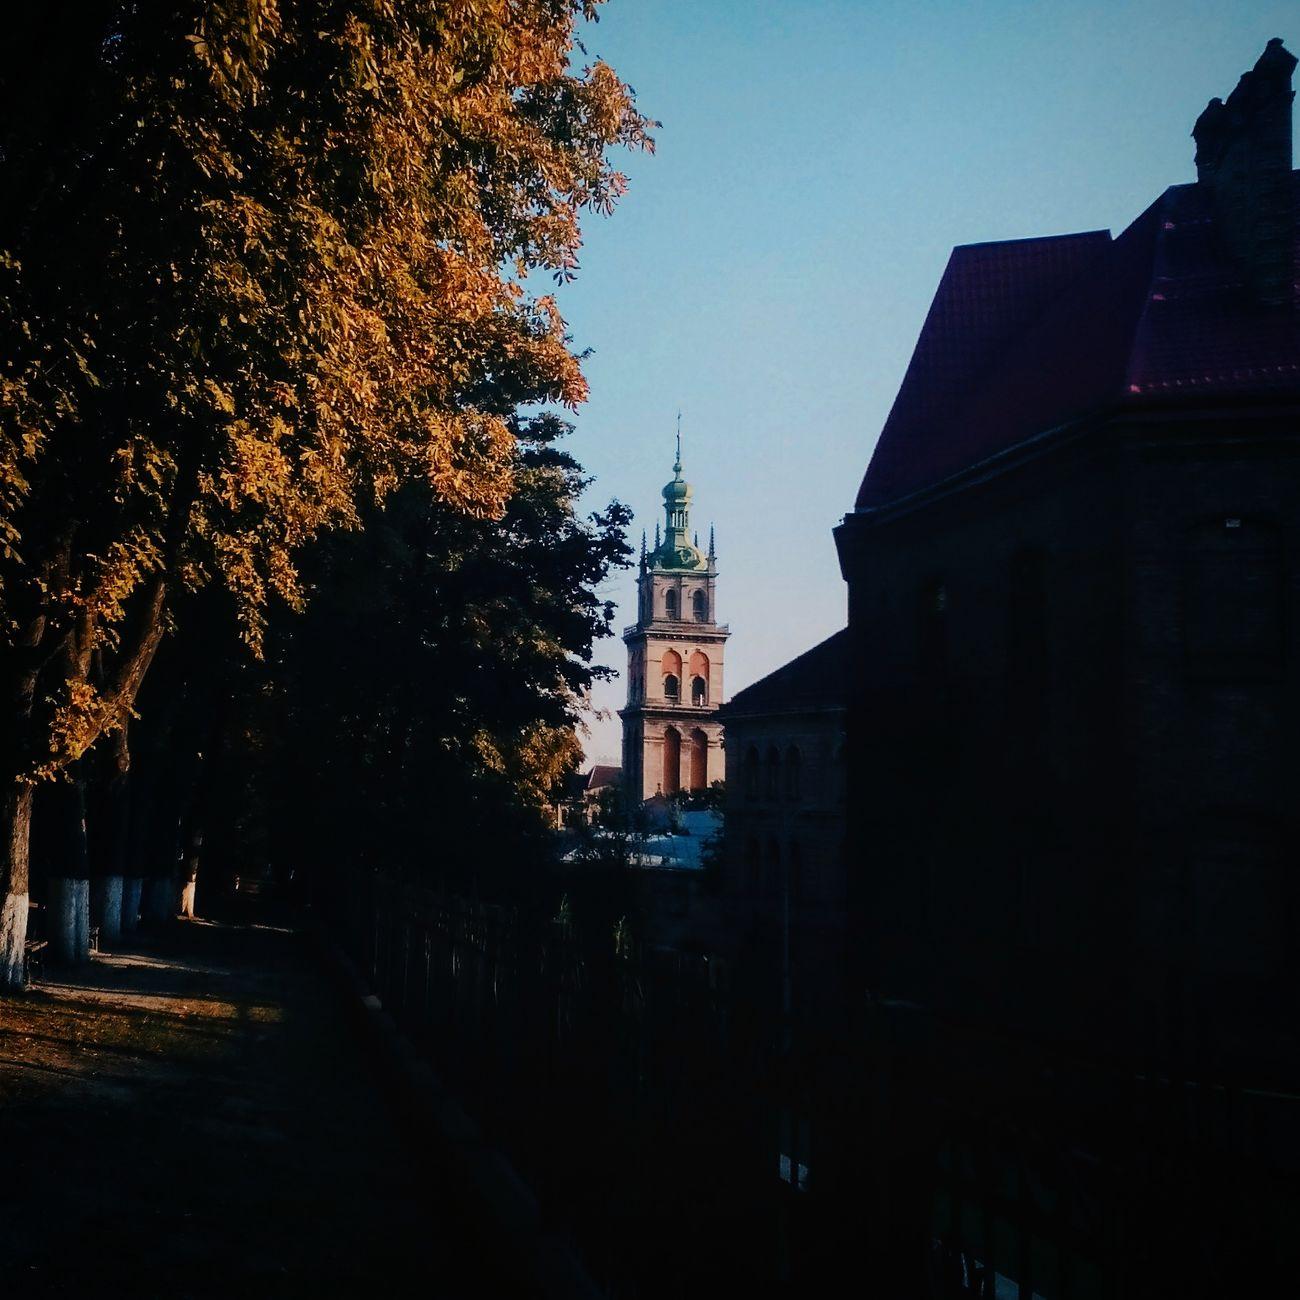 Lvivgram Lviv, Ukraine Lvivforyou Lviv1256 Lvivgo Autumn🍁🍁🍁 Autumn Autumn Melancholy Citycenter Vscogram Vscoua Vscogood VSCO Architecture First Eyeem Photo